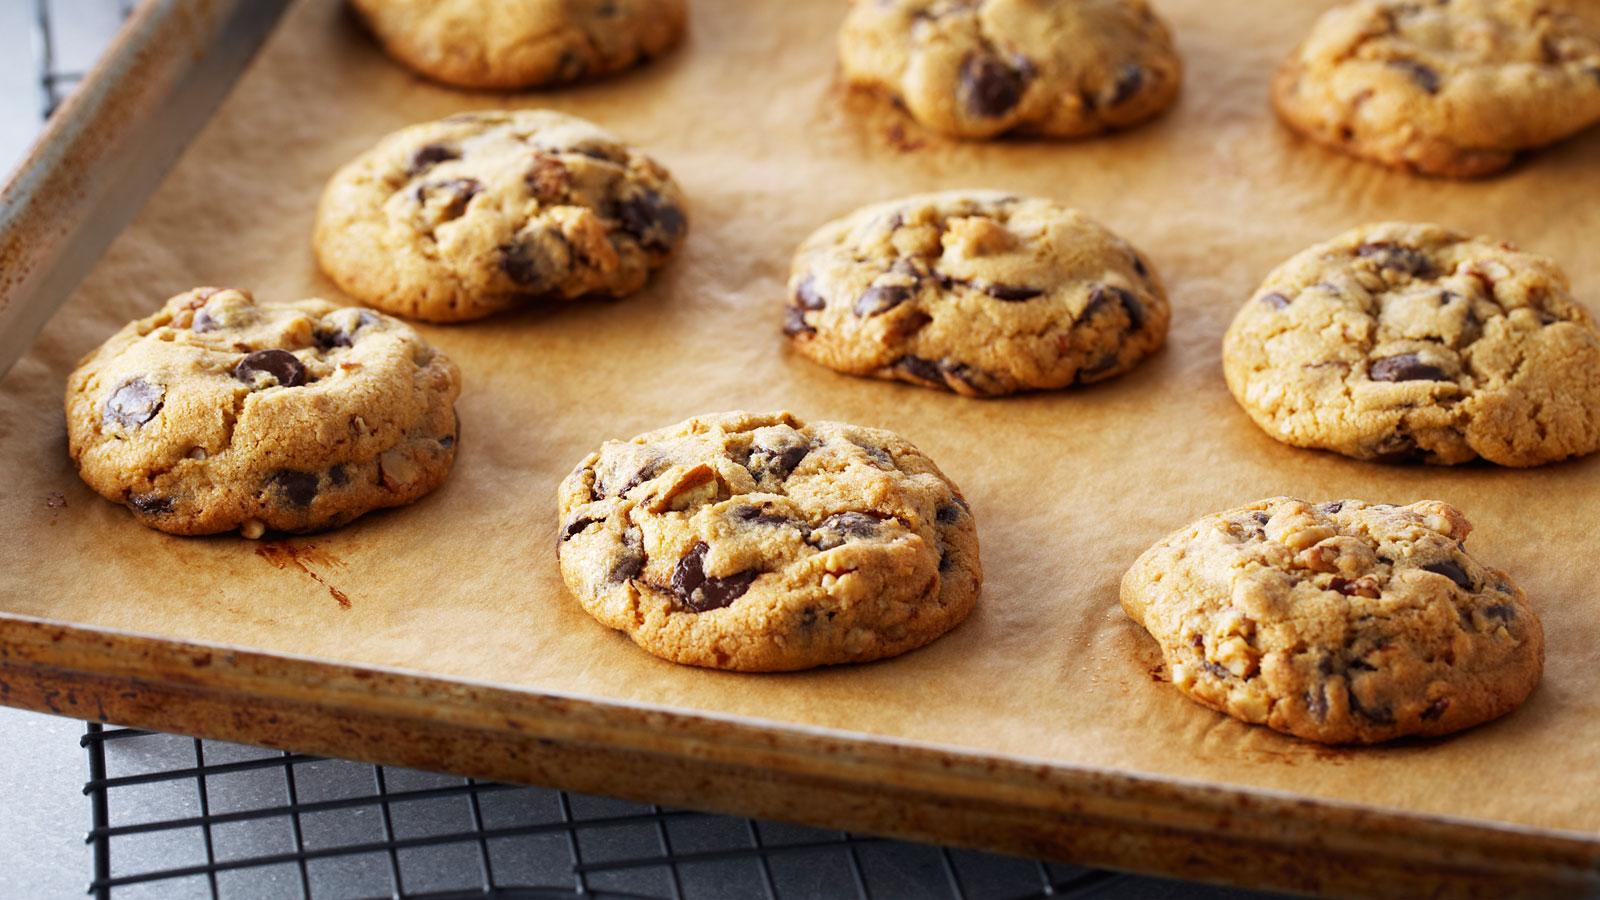 Galletas con pepitas de chocolate (Classic chocolate chip cookies) - Anna  Olson - Receta - Canal Cocina